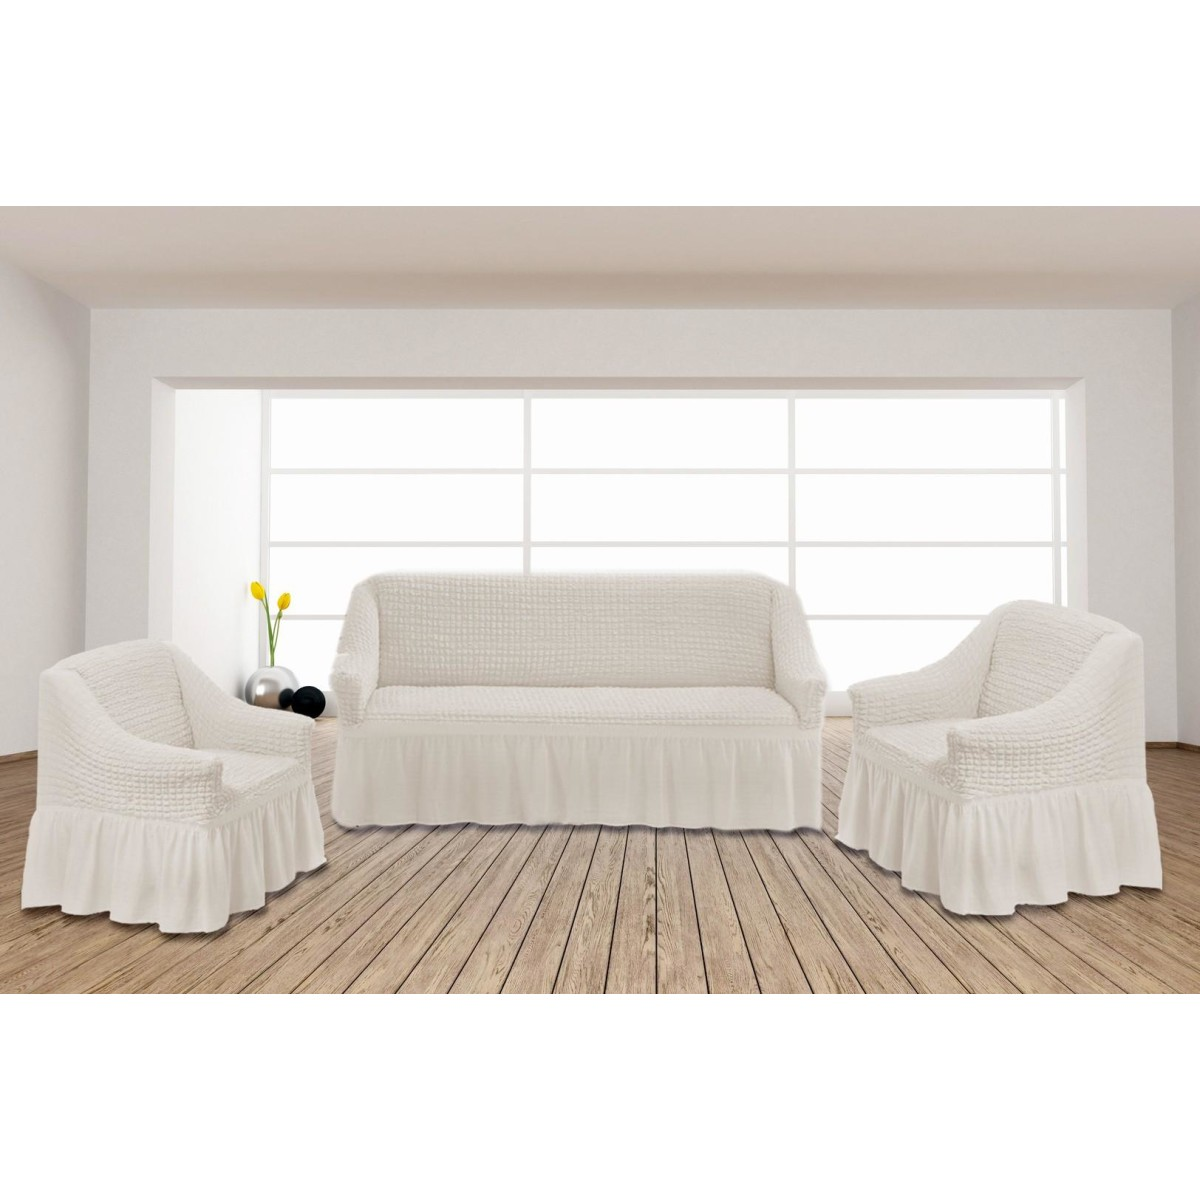 Комплект чехлов для мебели Texrepublic Absolute 8822